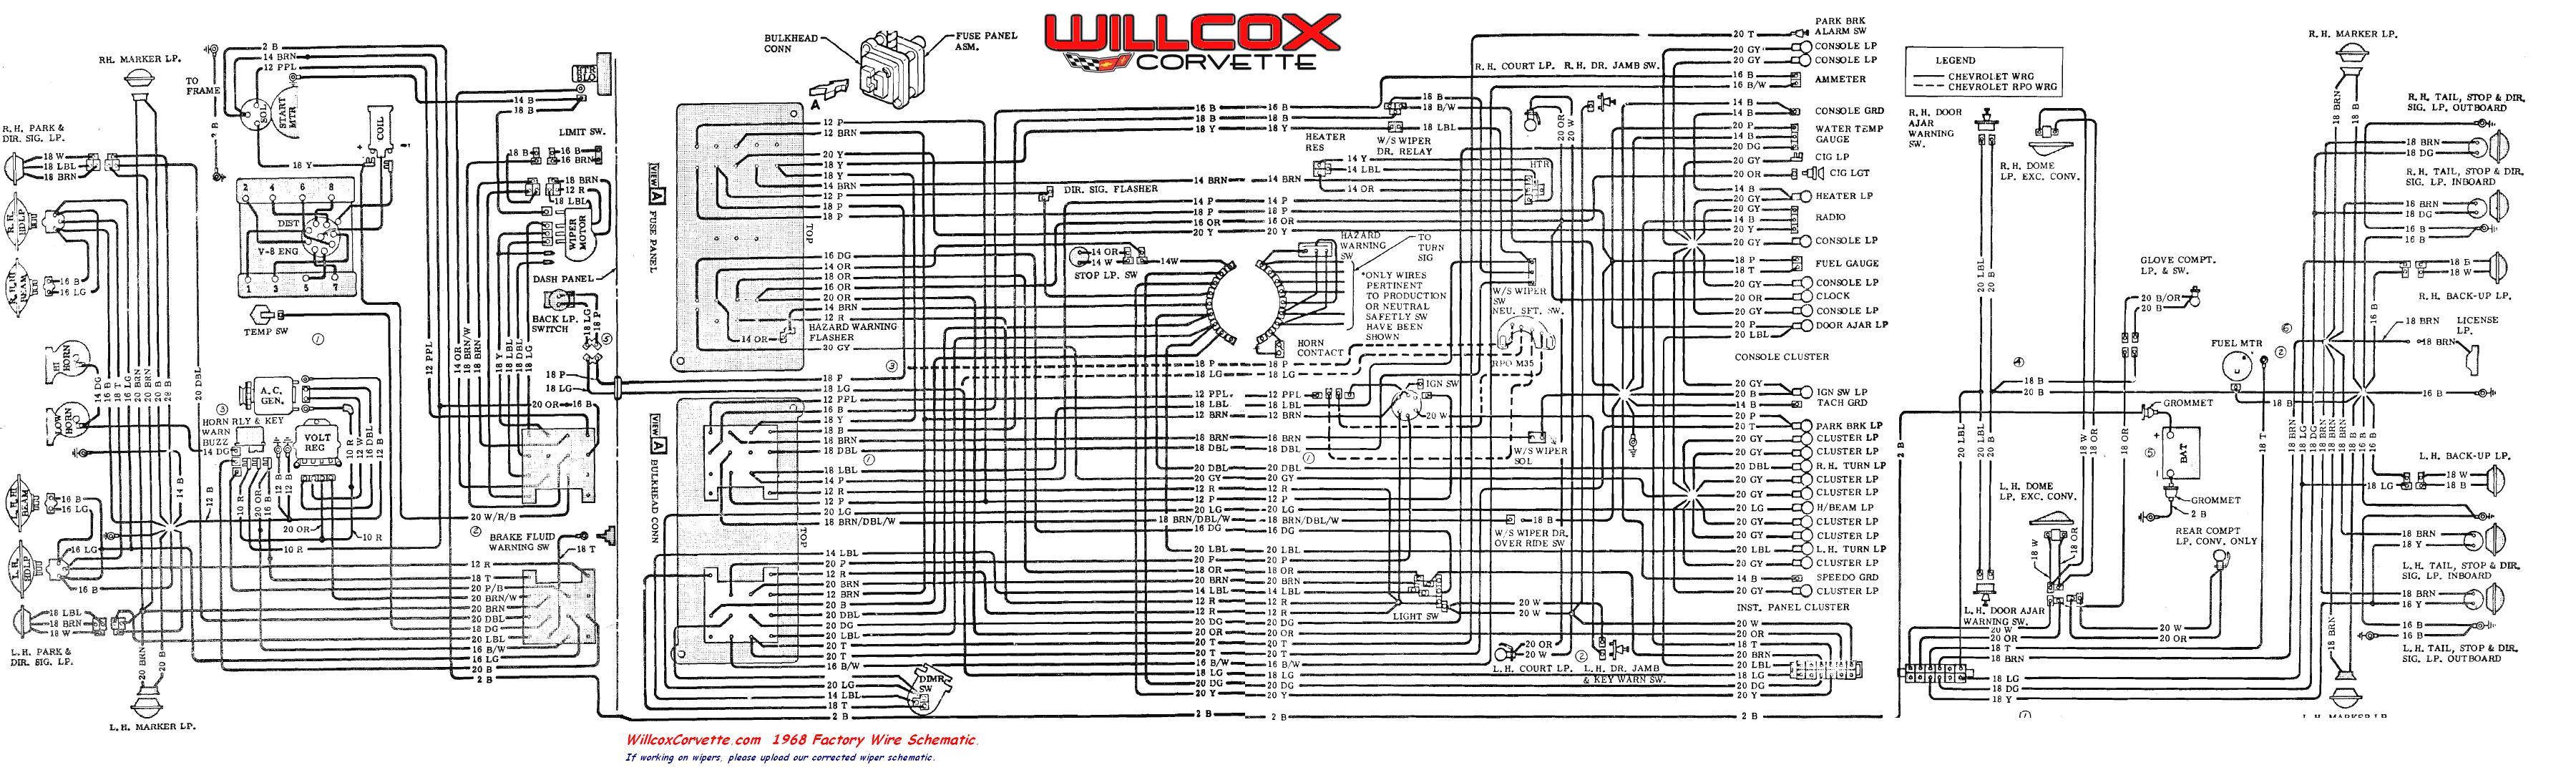 baja 90cc atv wiring diagram diagram wd bajawd90